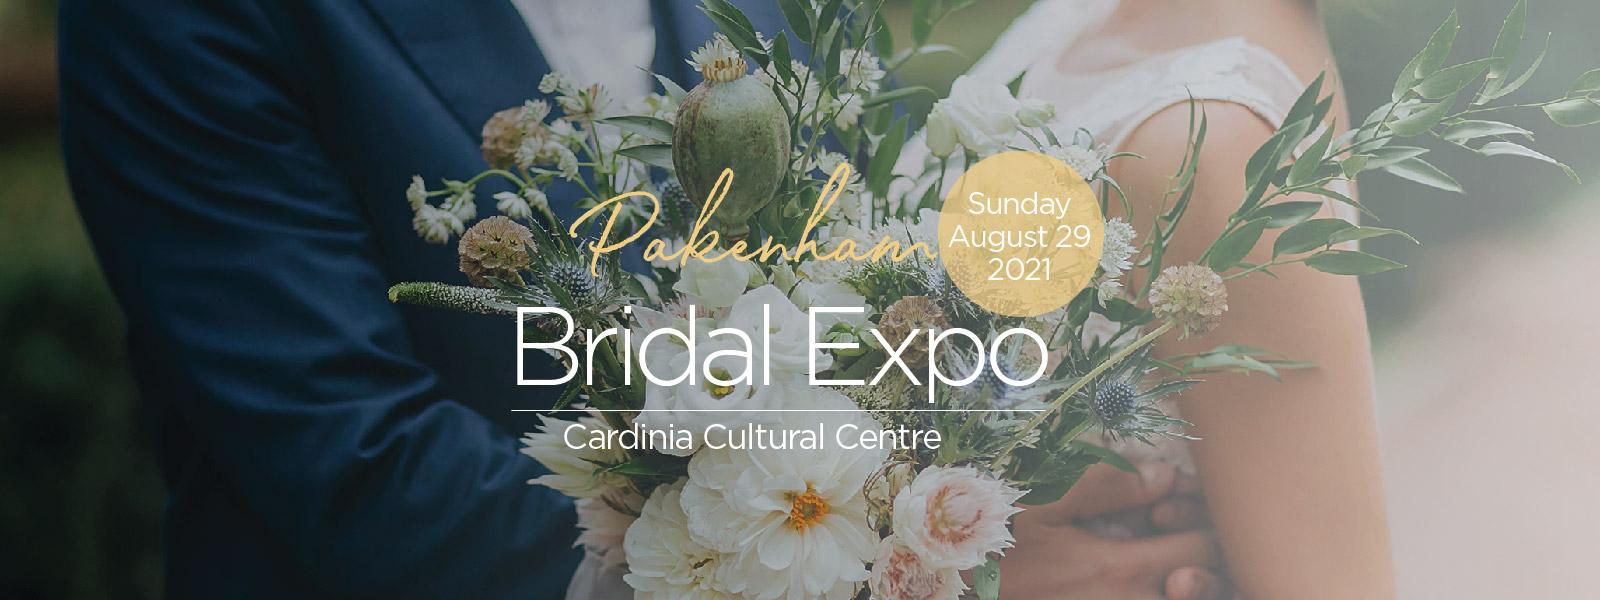 Pakenham Bridal Expo 29 August 2021